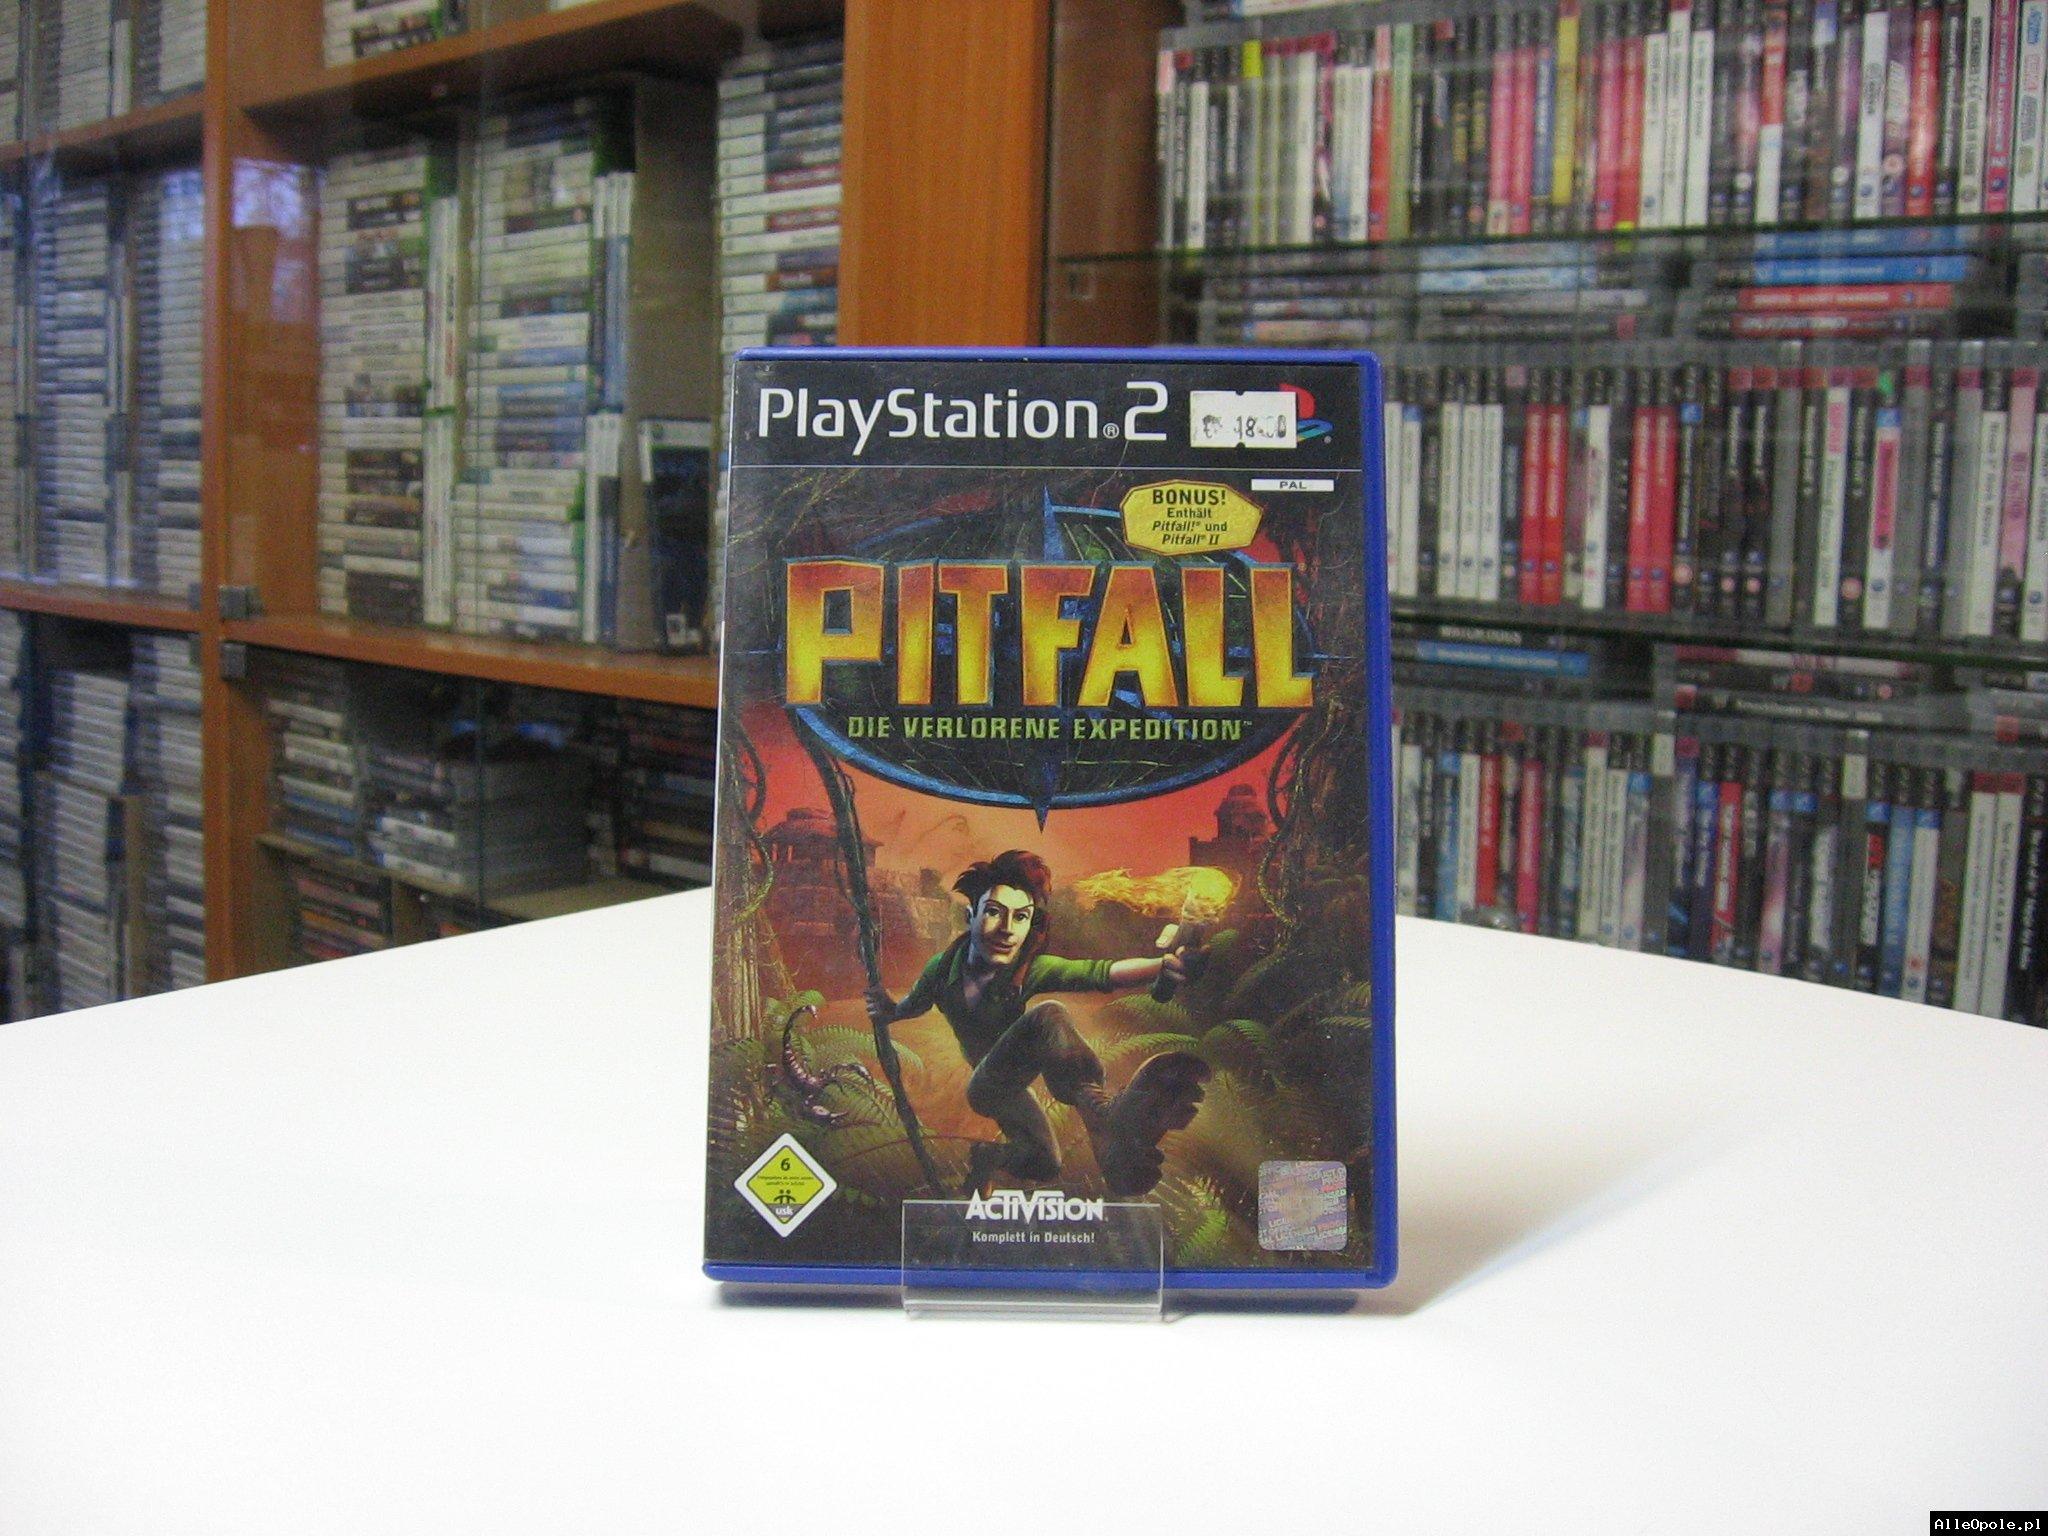 Pitfall - GRA Ps2 - Opole 0554